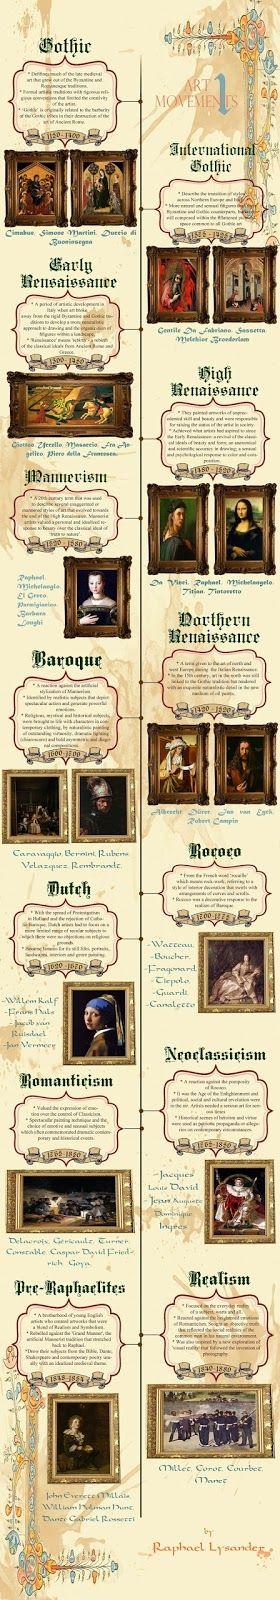 Art movements from gothic to realism gothic infographic and art art movements from gothic to realism altavistaventures Images